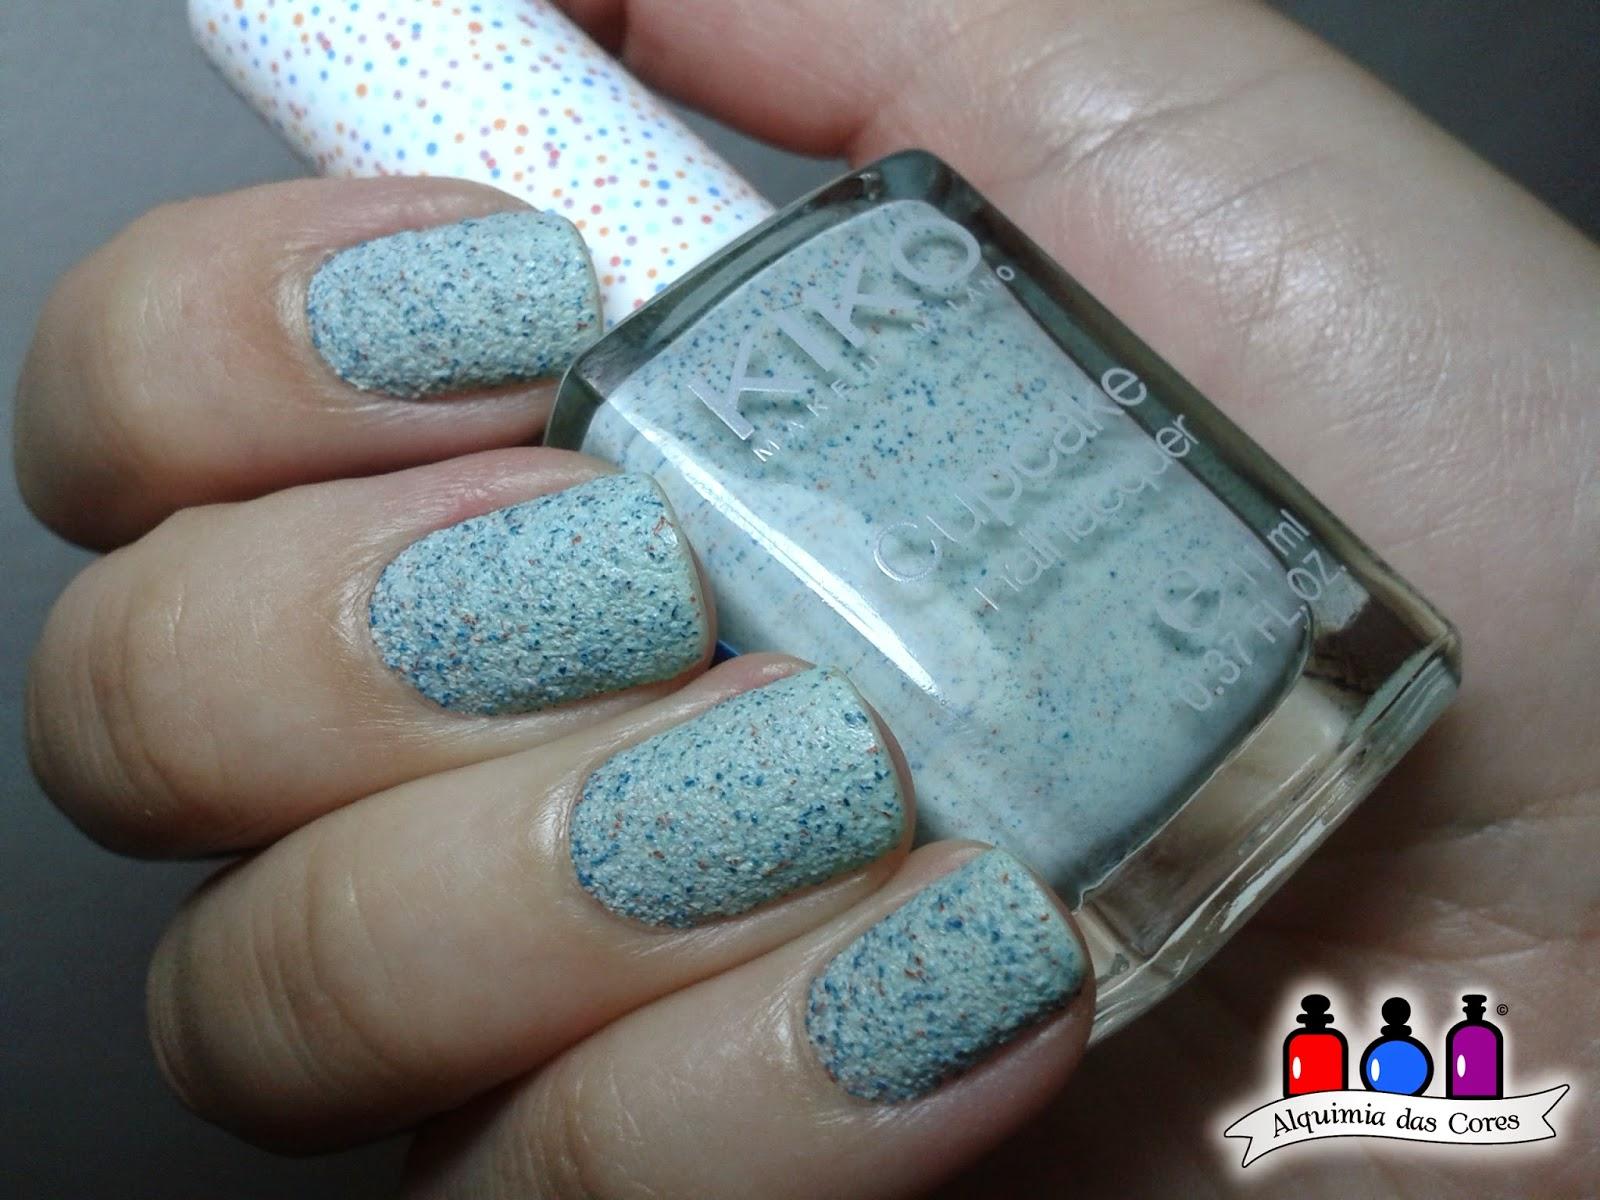 Caminie, Kiko, texturizado, liquid sand, verde, esmalte, nail polish, cupcake, 655